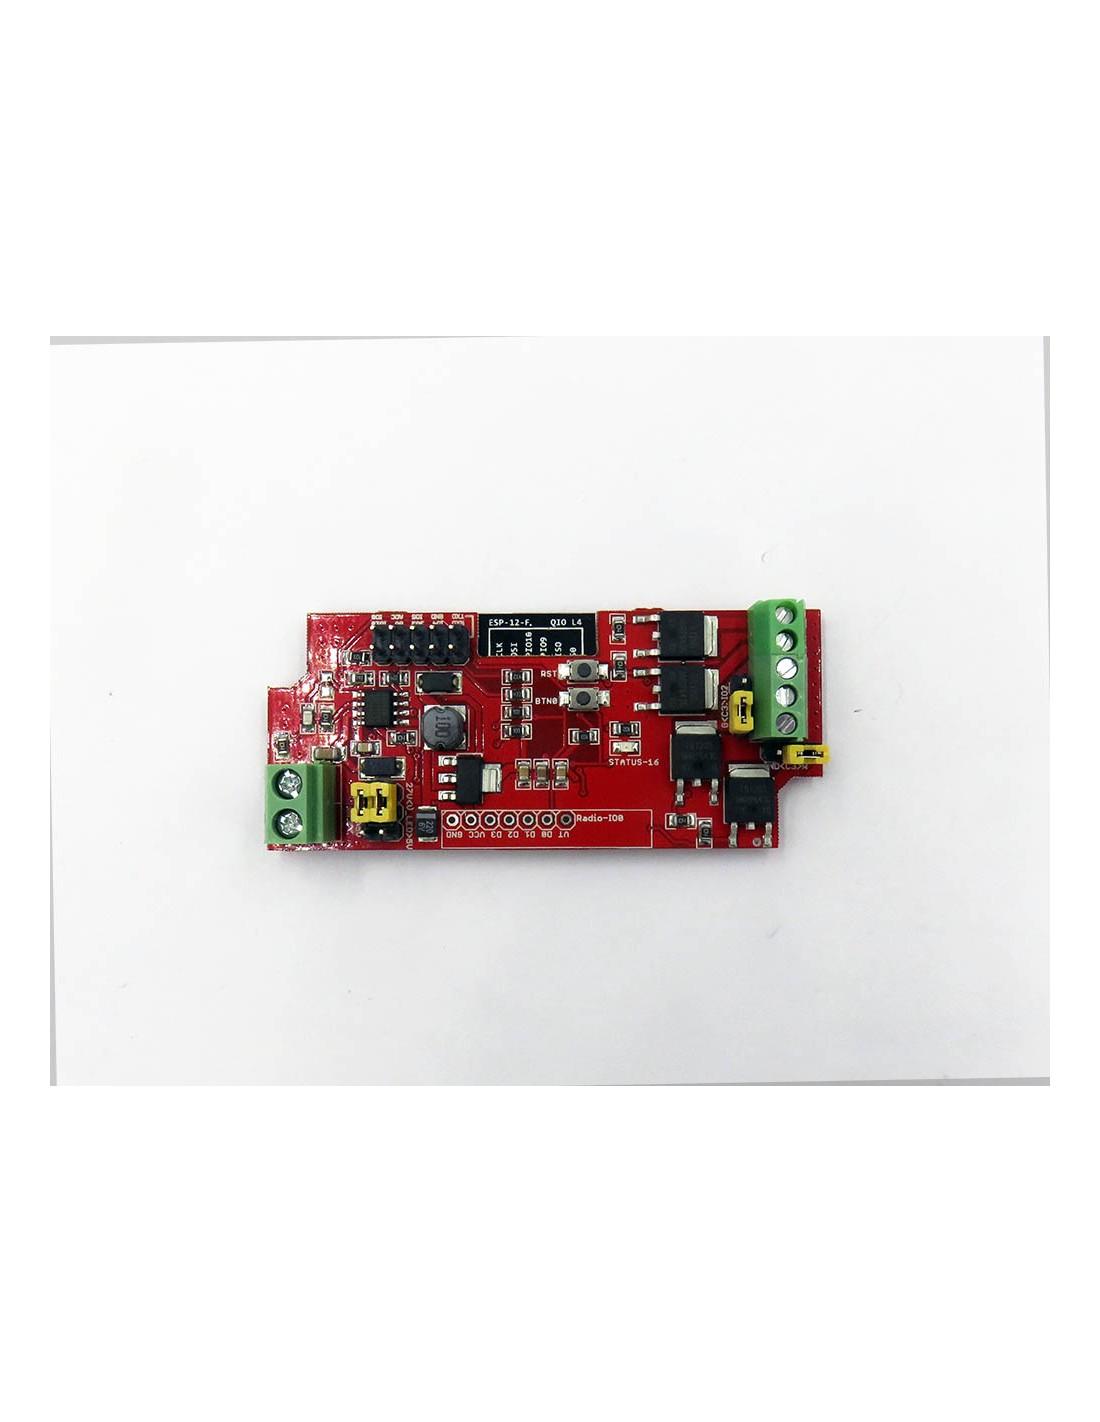 Esp Led Strip Board Esp8266 Wifi Ic 12f Module Ledstrip Programming